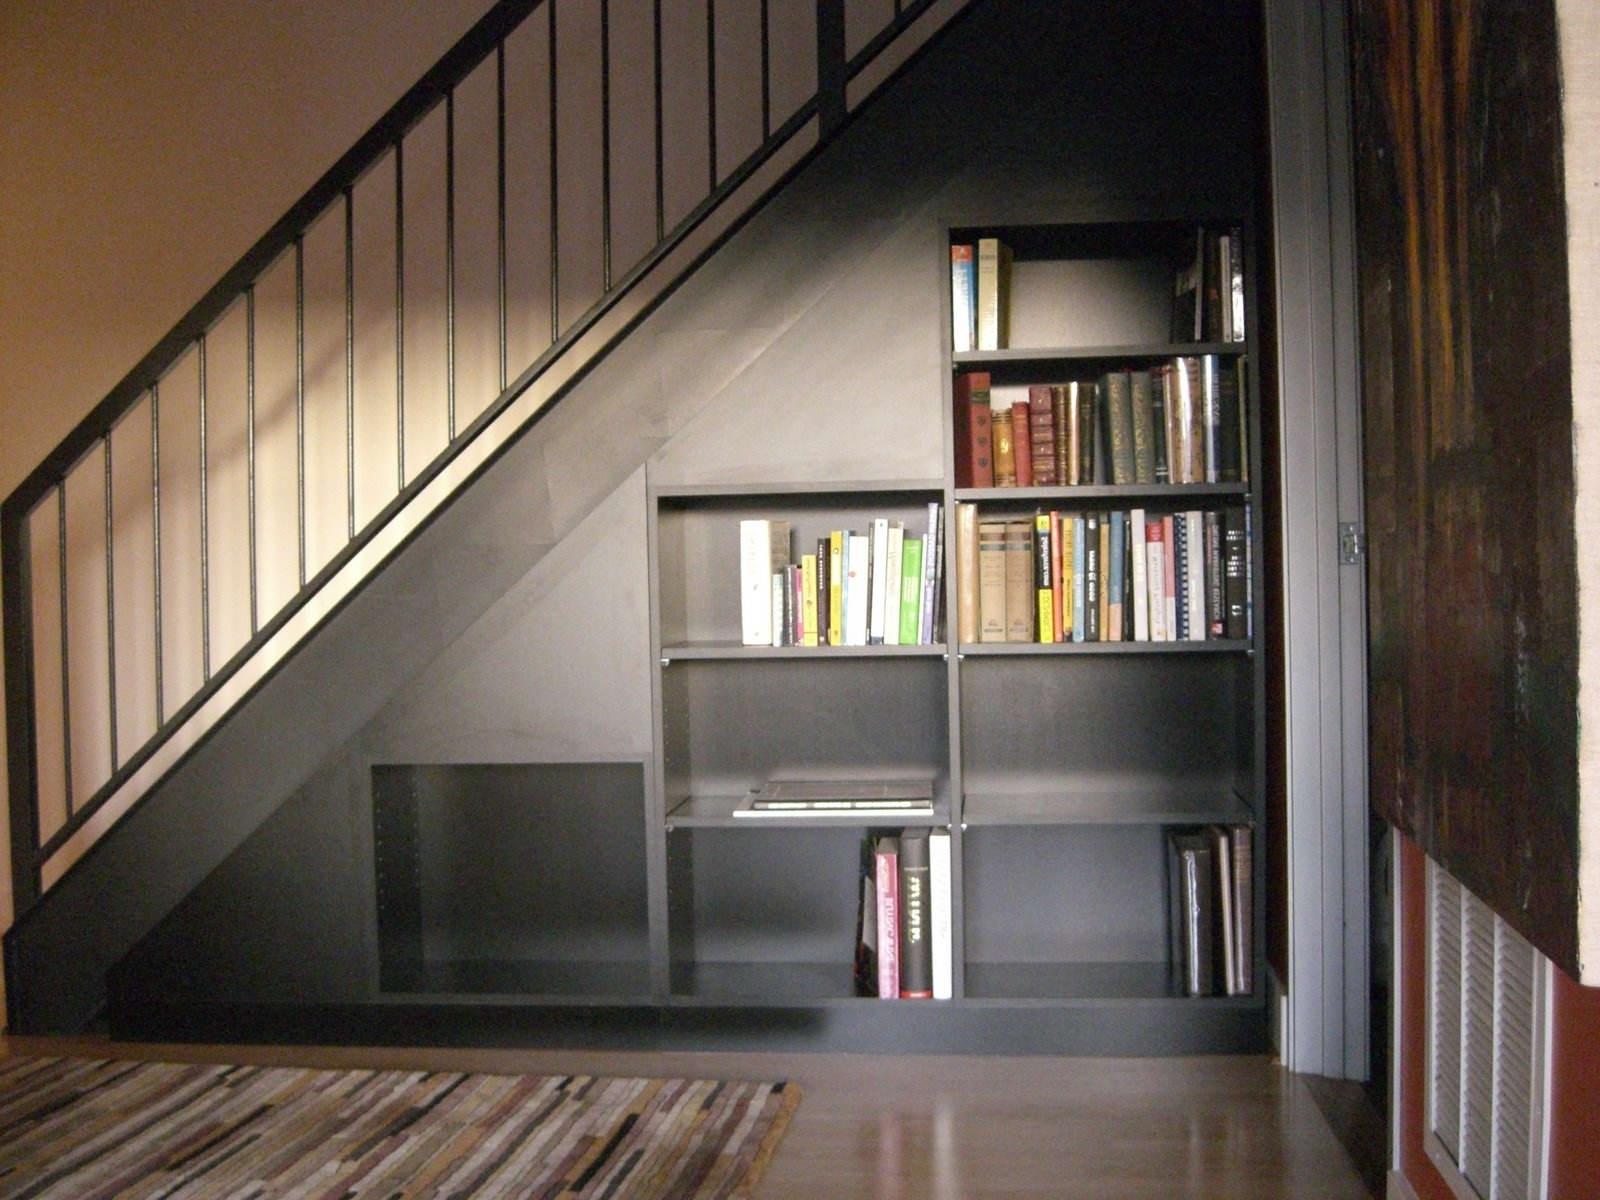 Furniture : Elegant Storage Under Stair Decor With Small Brown Regarding Best And Newest Computer Desks Under Stairs (View 10 of 20)